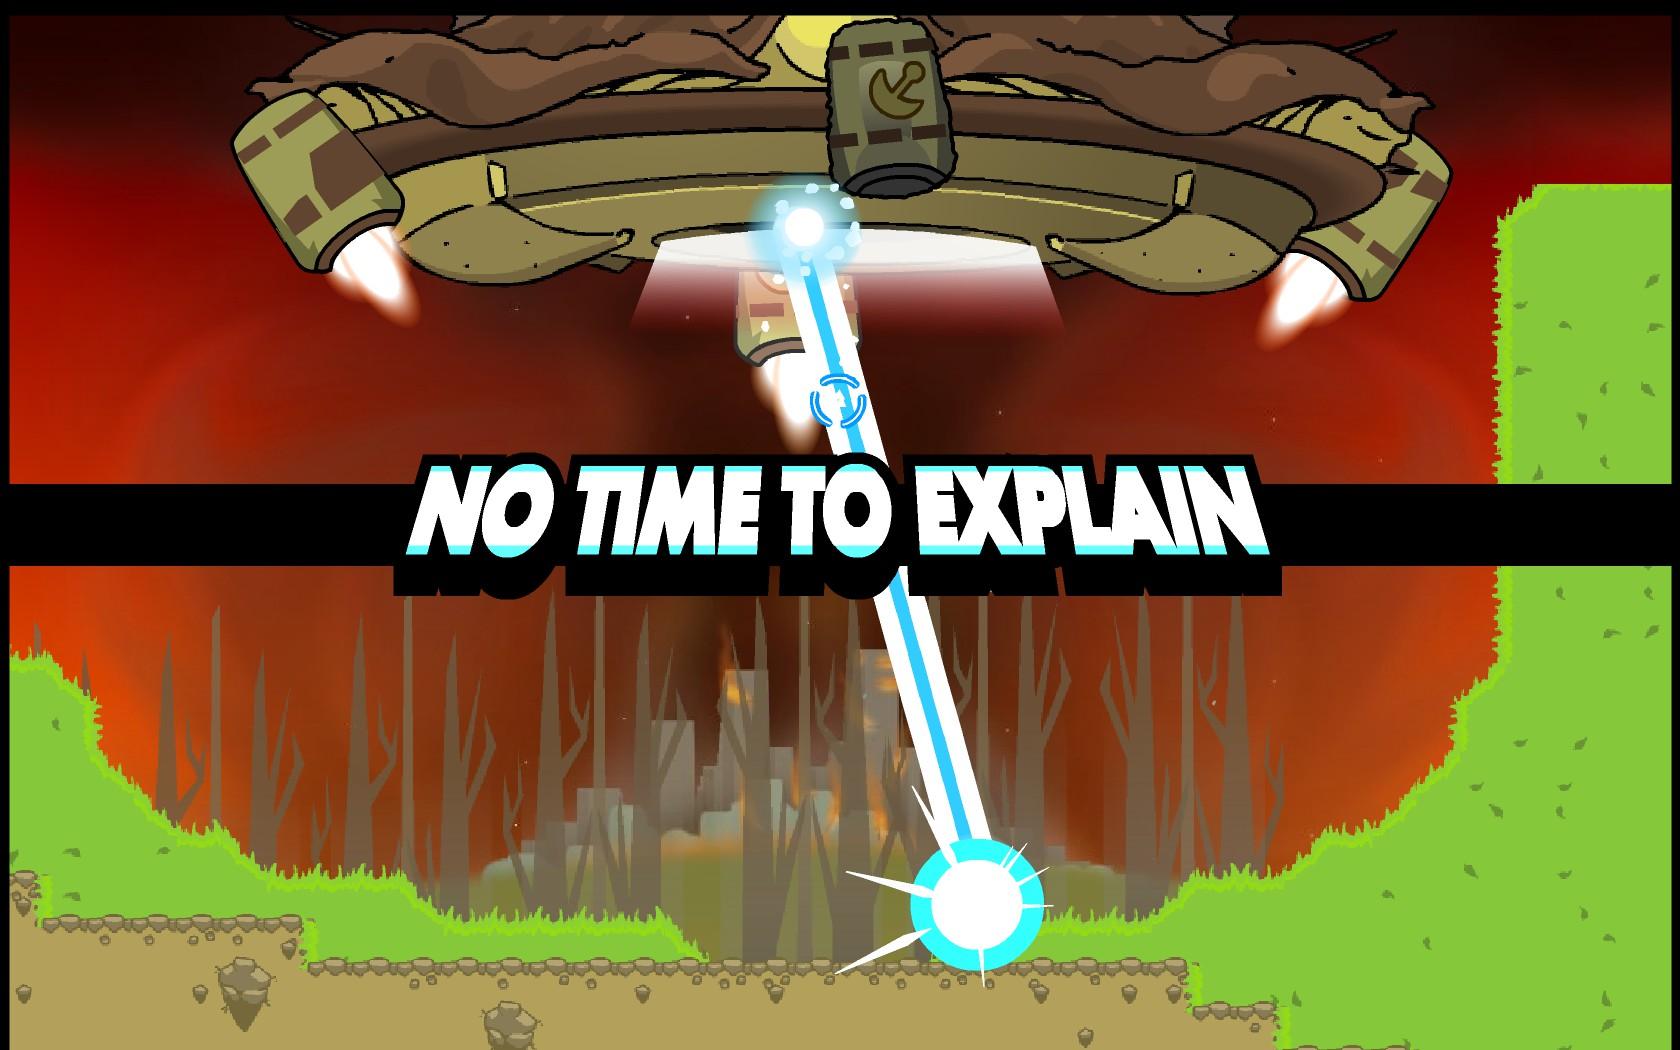 Игра No Time to Explain 2 бесплатно - Онлайн игры